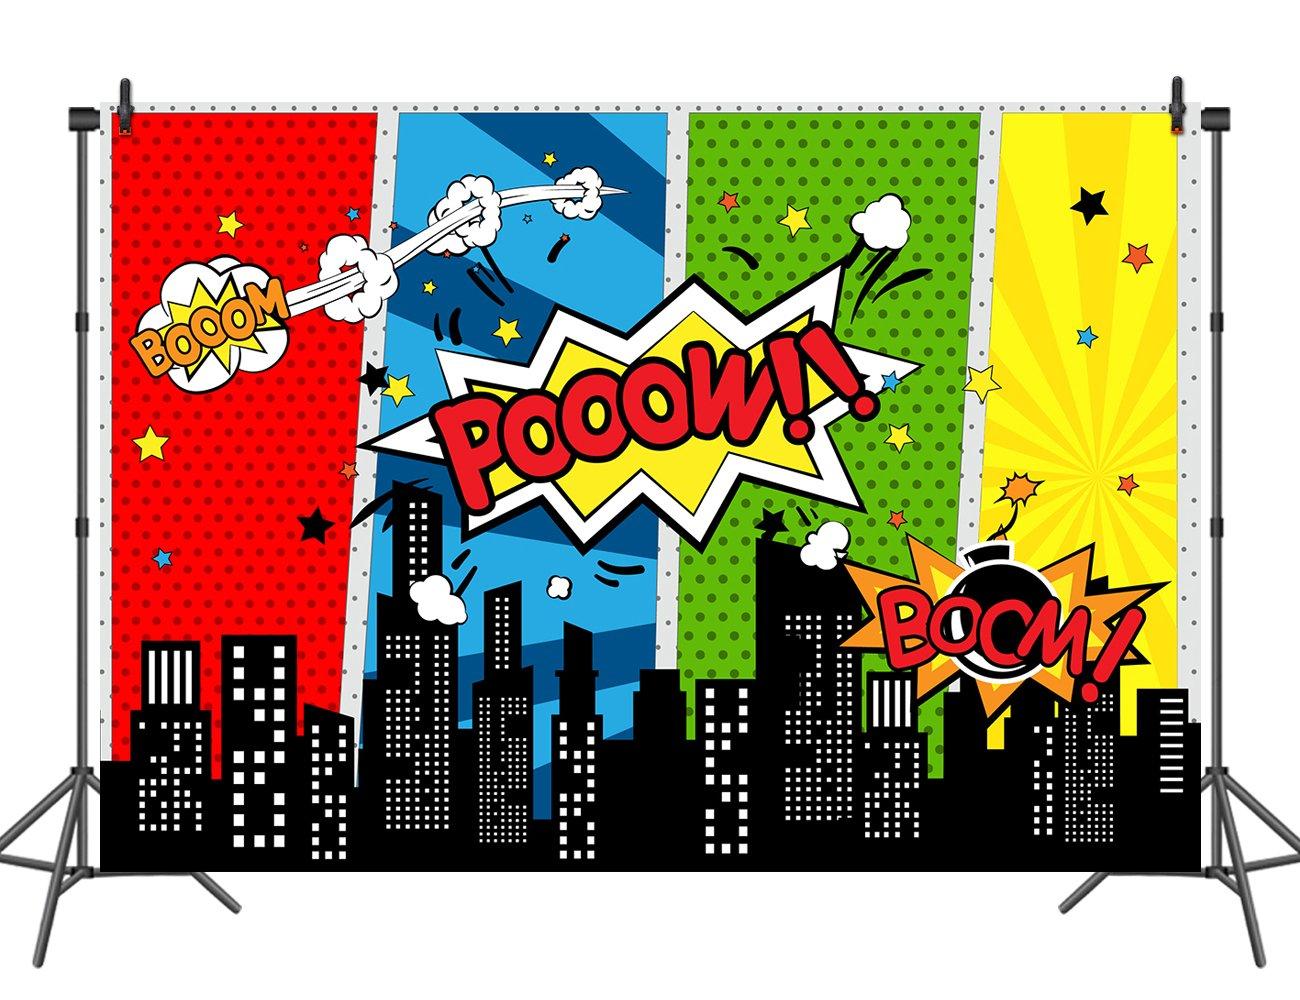 sensfun Super Hero CITYビニールバックドロップ画像子供フォトスタジオ小道具誕生日パーティー装飾用写真背景7 x 5 ft 10'x6.5ft  B07FP271J2